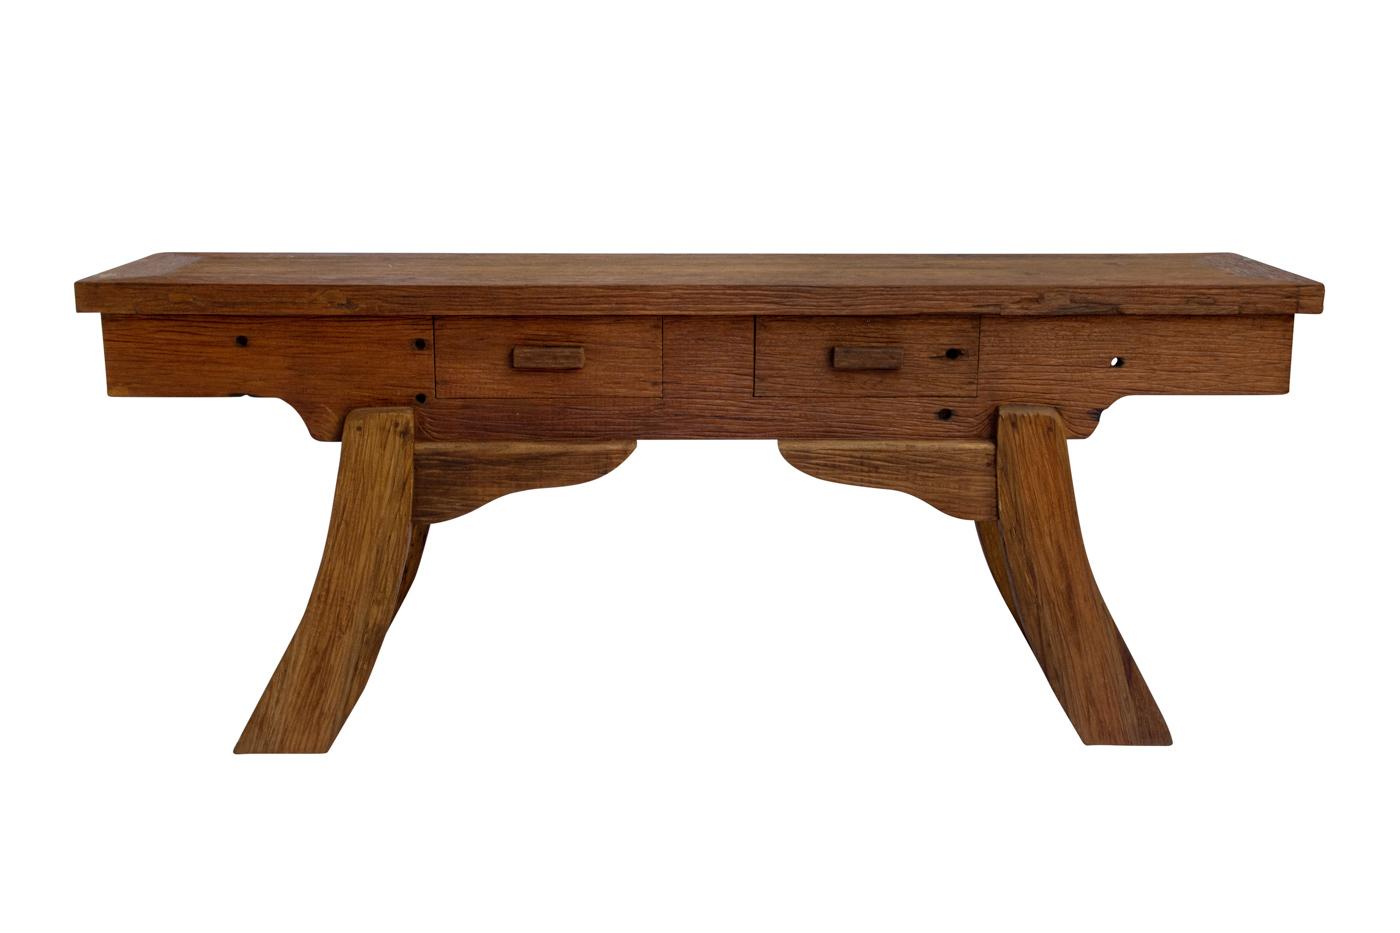 Balinese console in teak wood